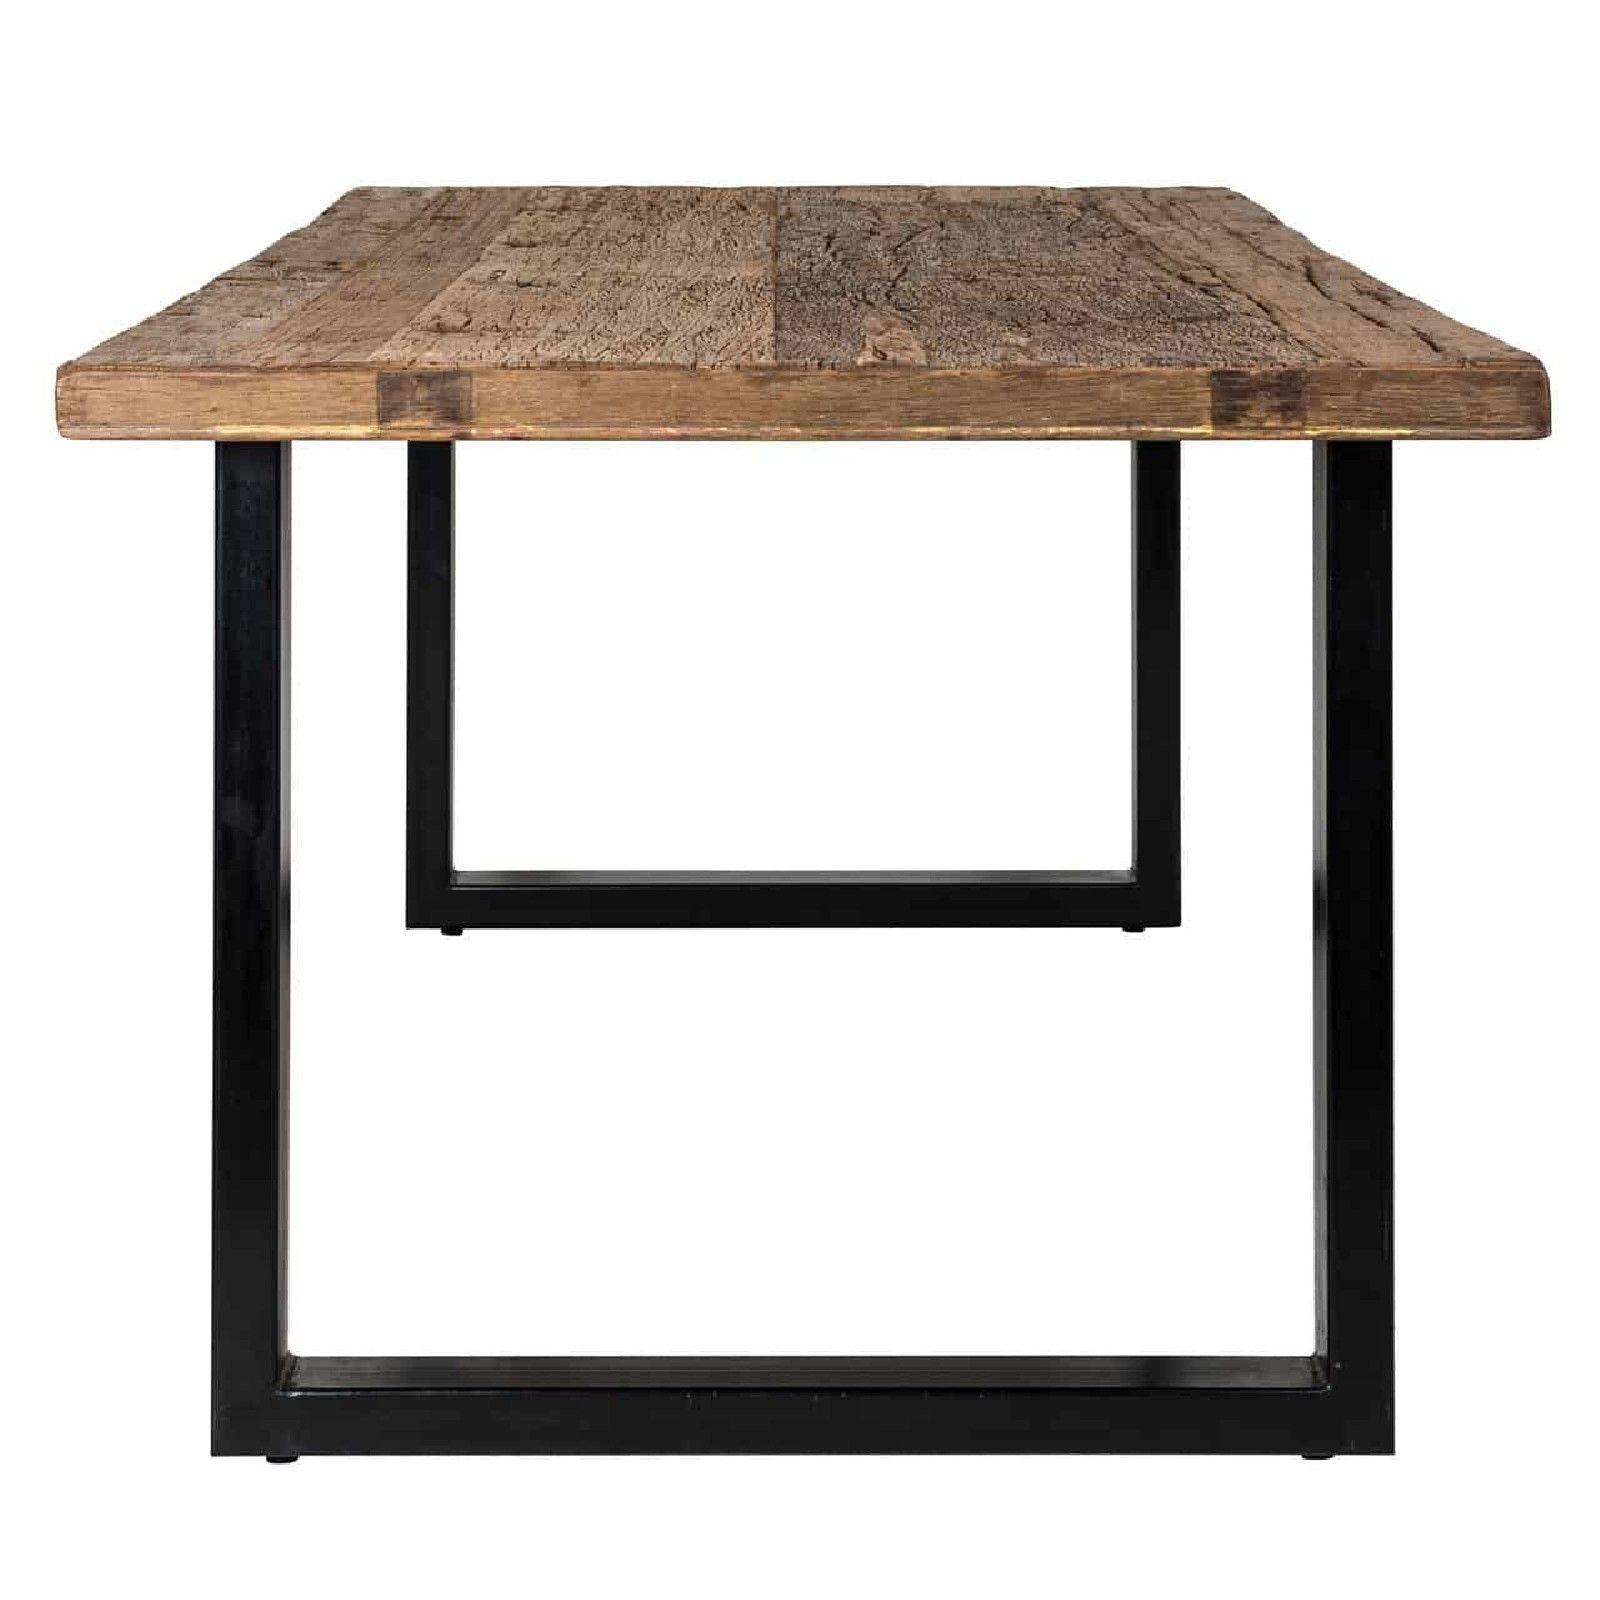 Table à dîner Raffles 240, Recyceld wood Meuble Déco Tendance - 103